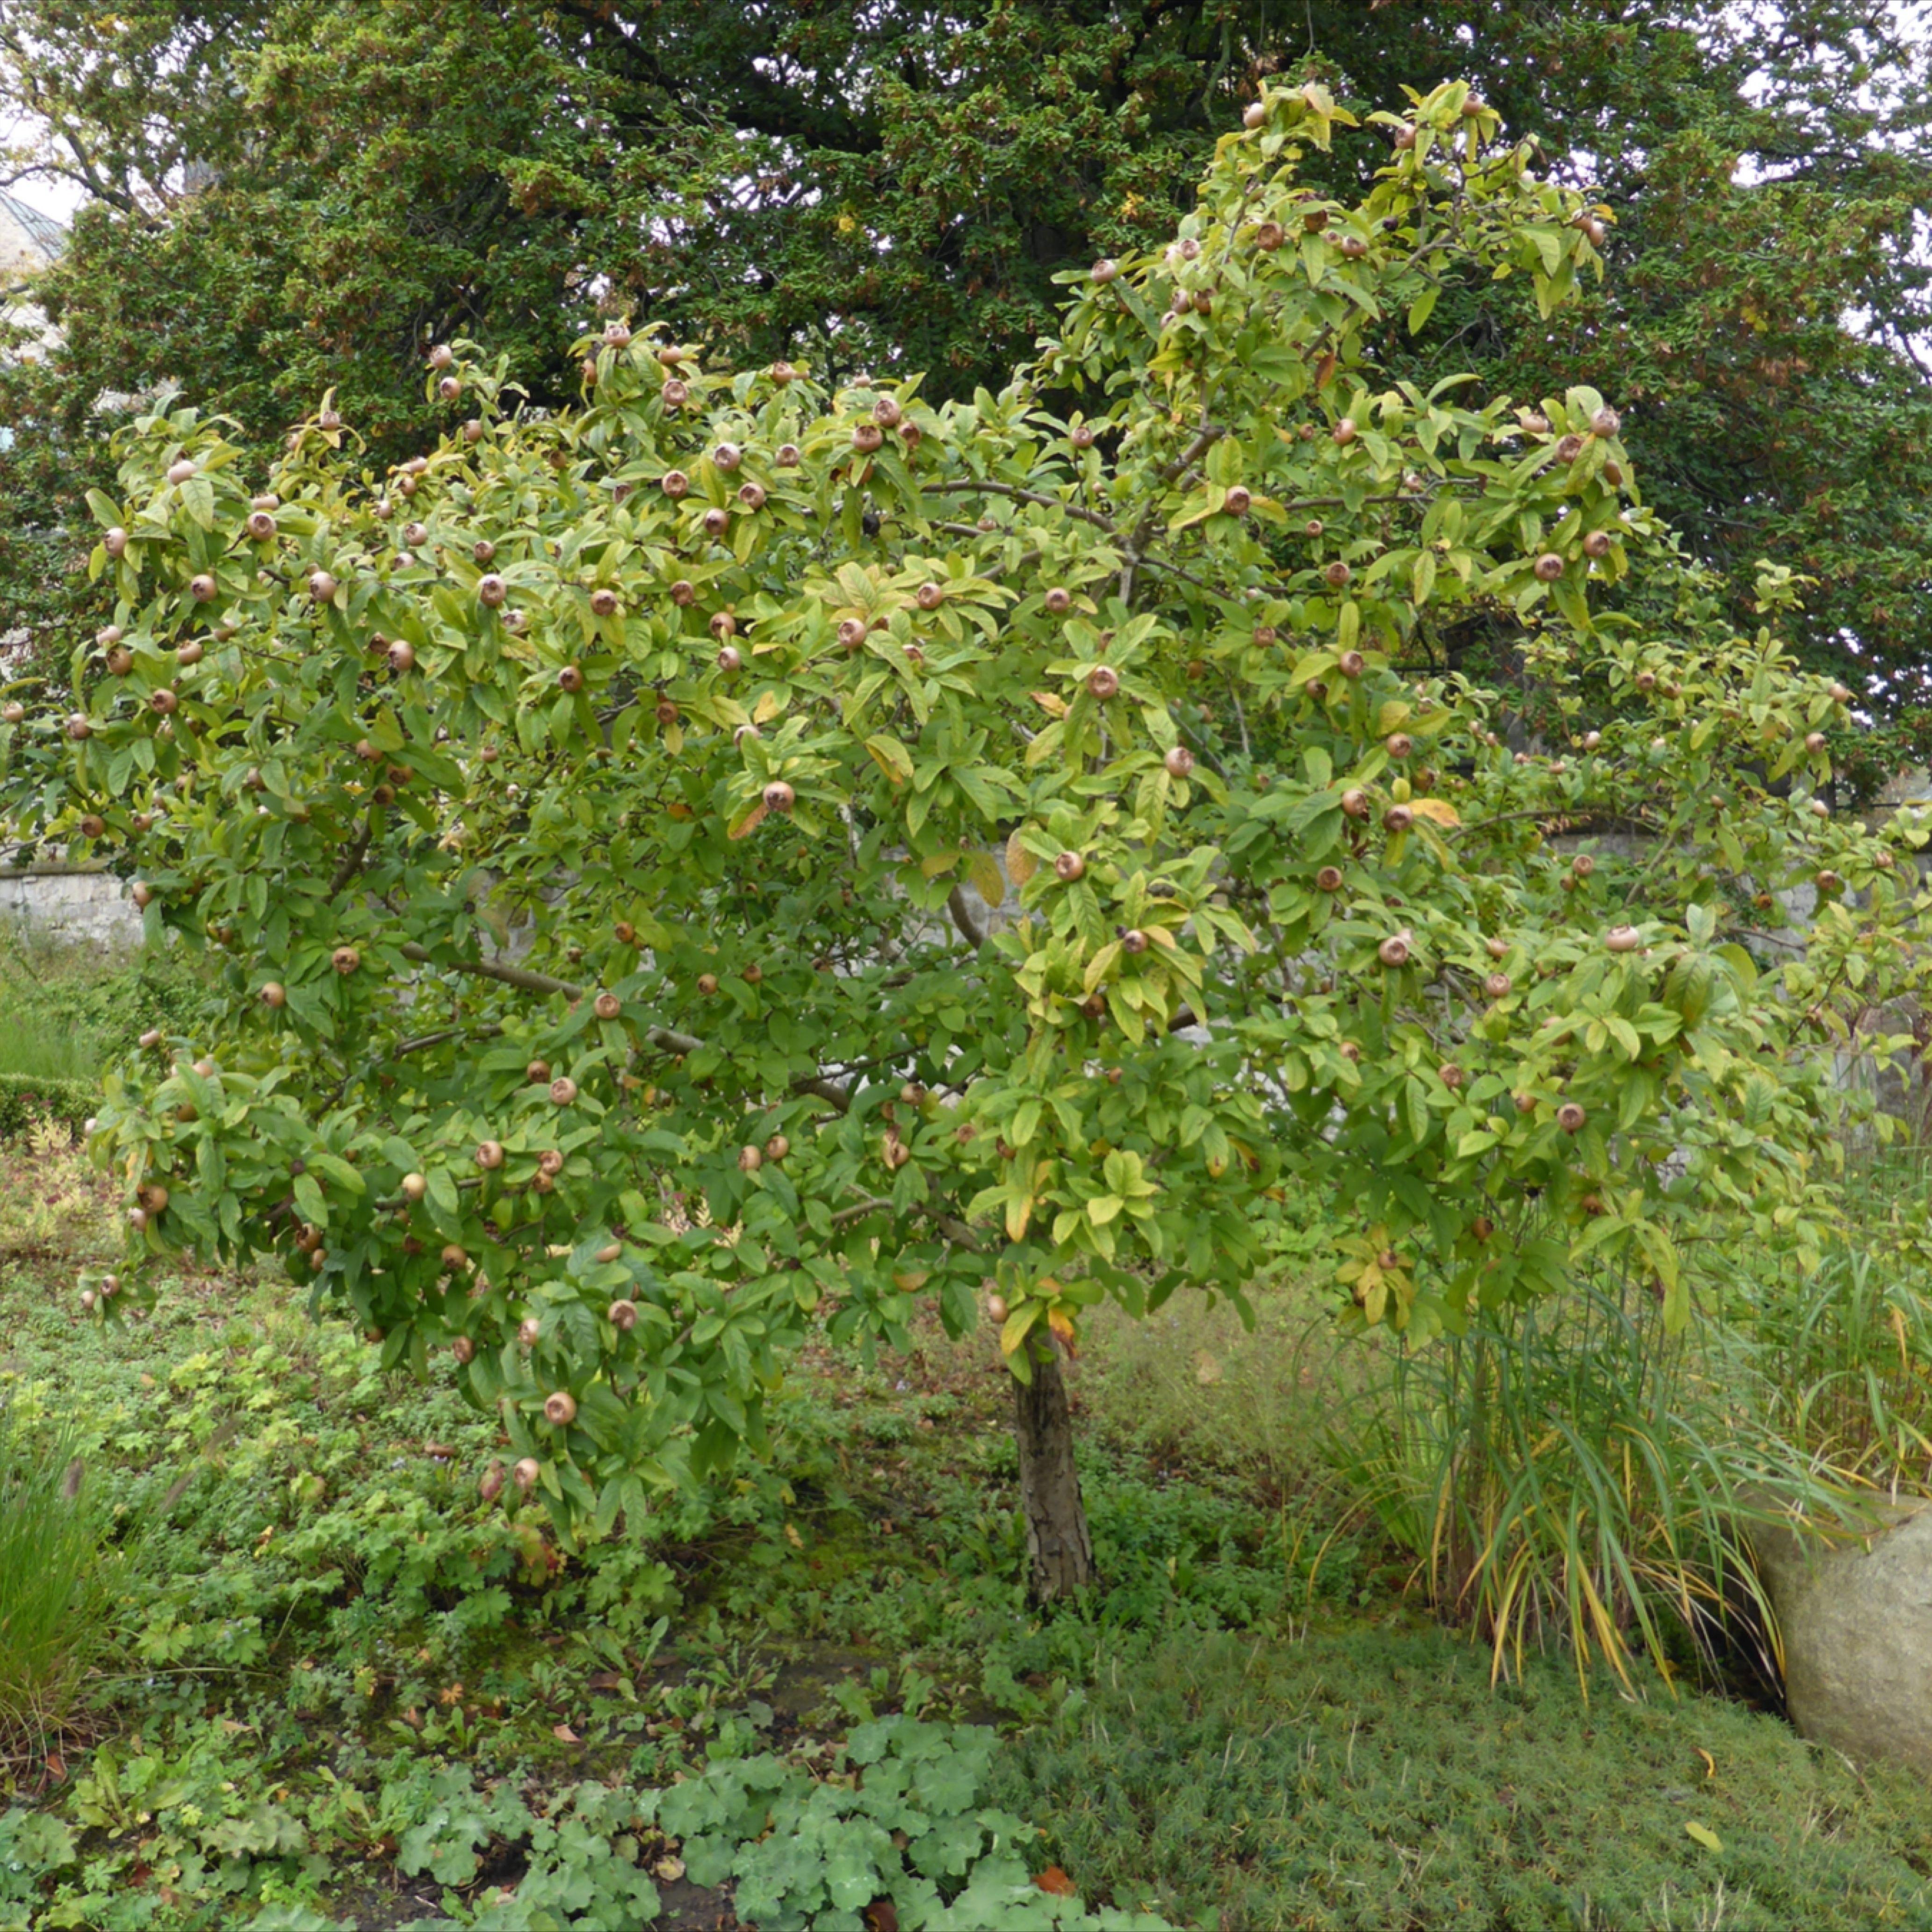 Mispel Ein Fast Vergessenes Obstgeholz In 2020 Obstgeholze Mispel Mispel Baum